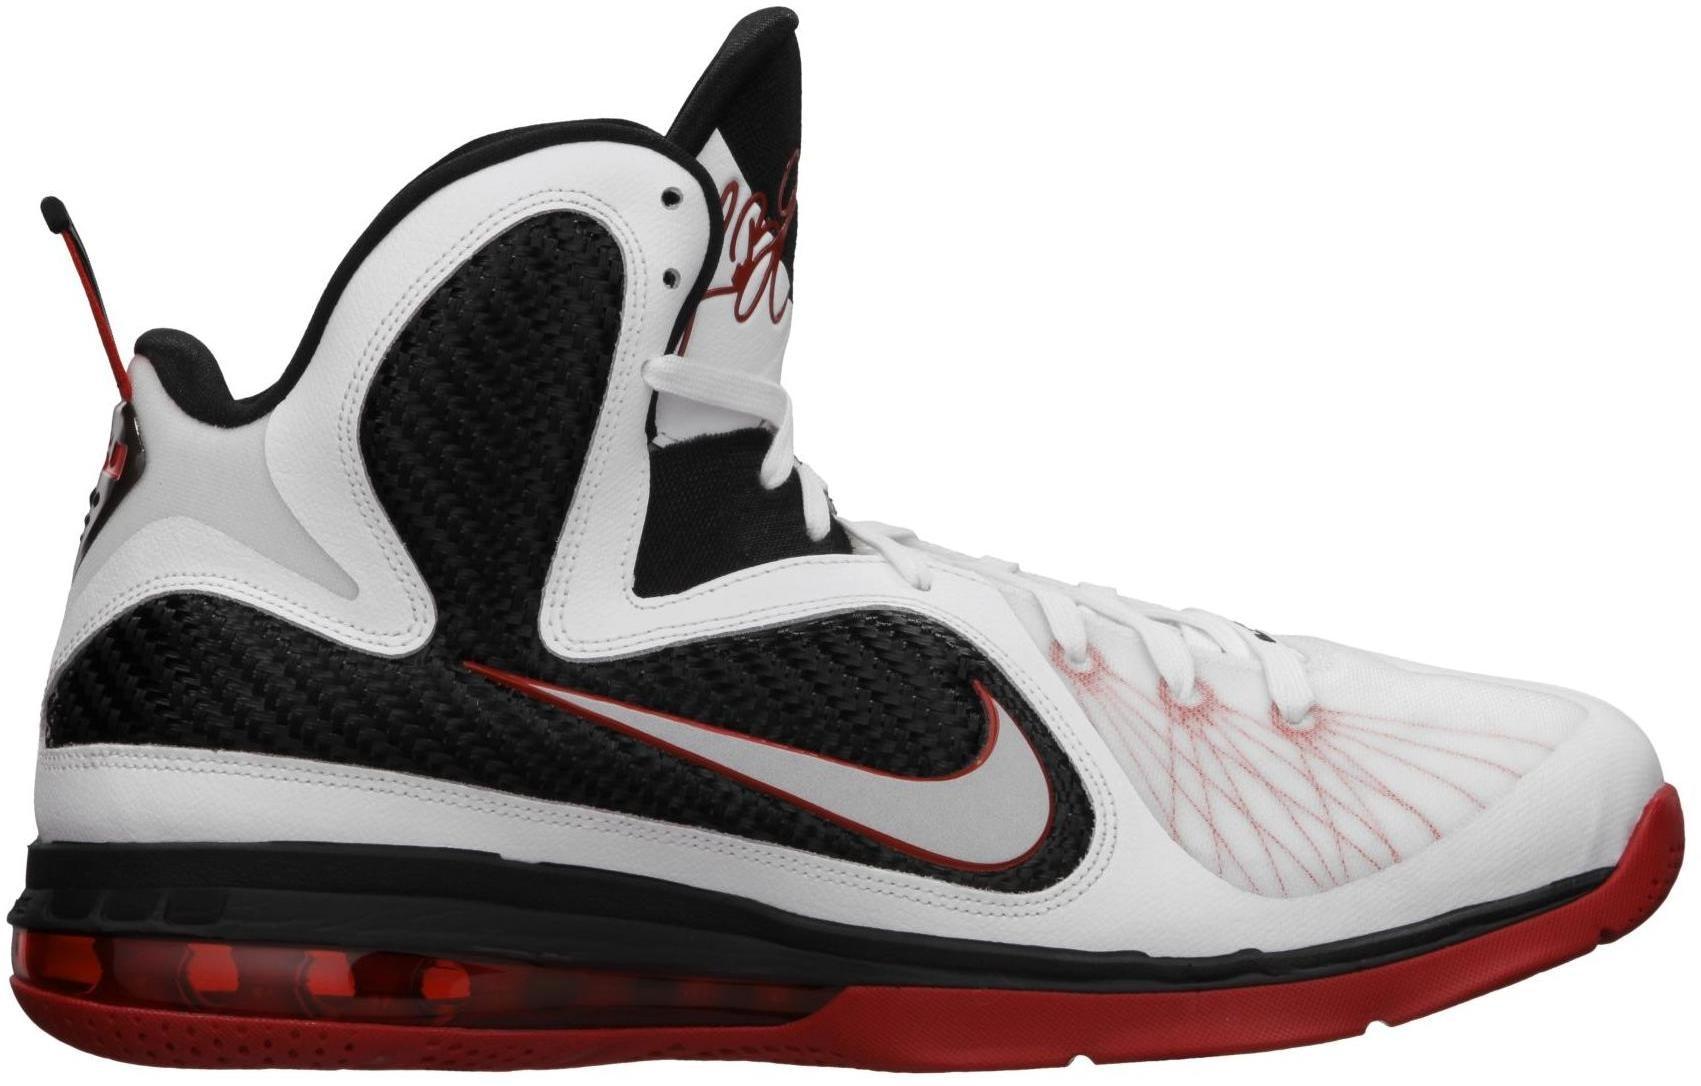 LeBron 9 Miami Heat Home